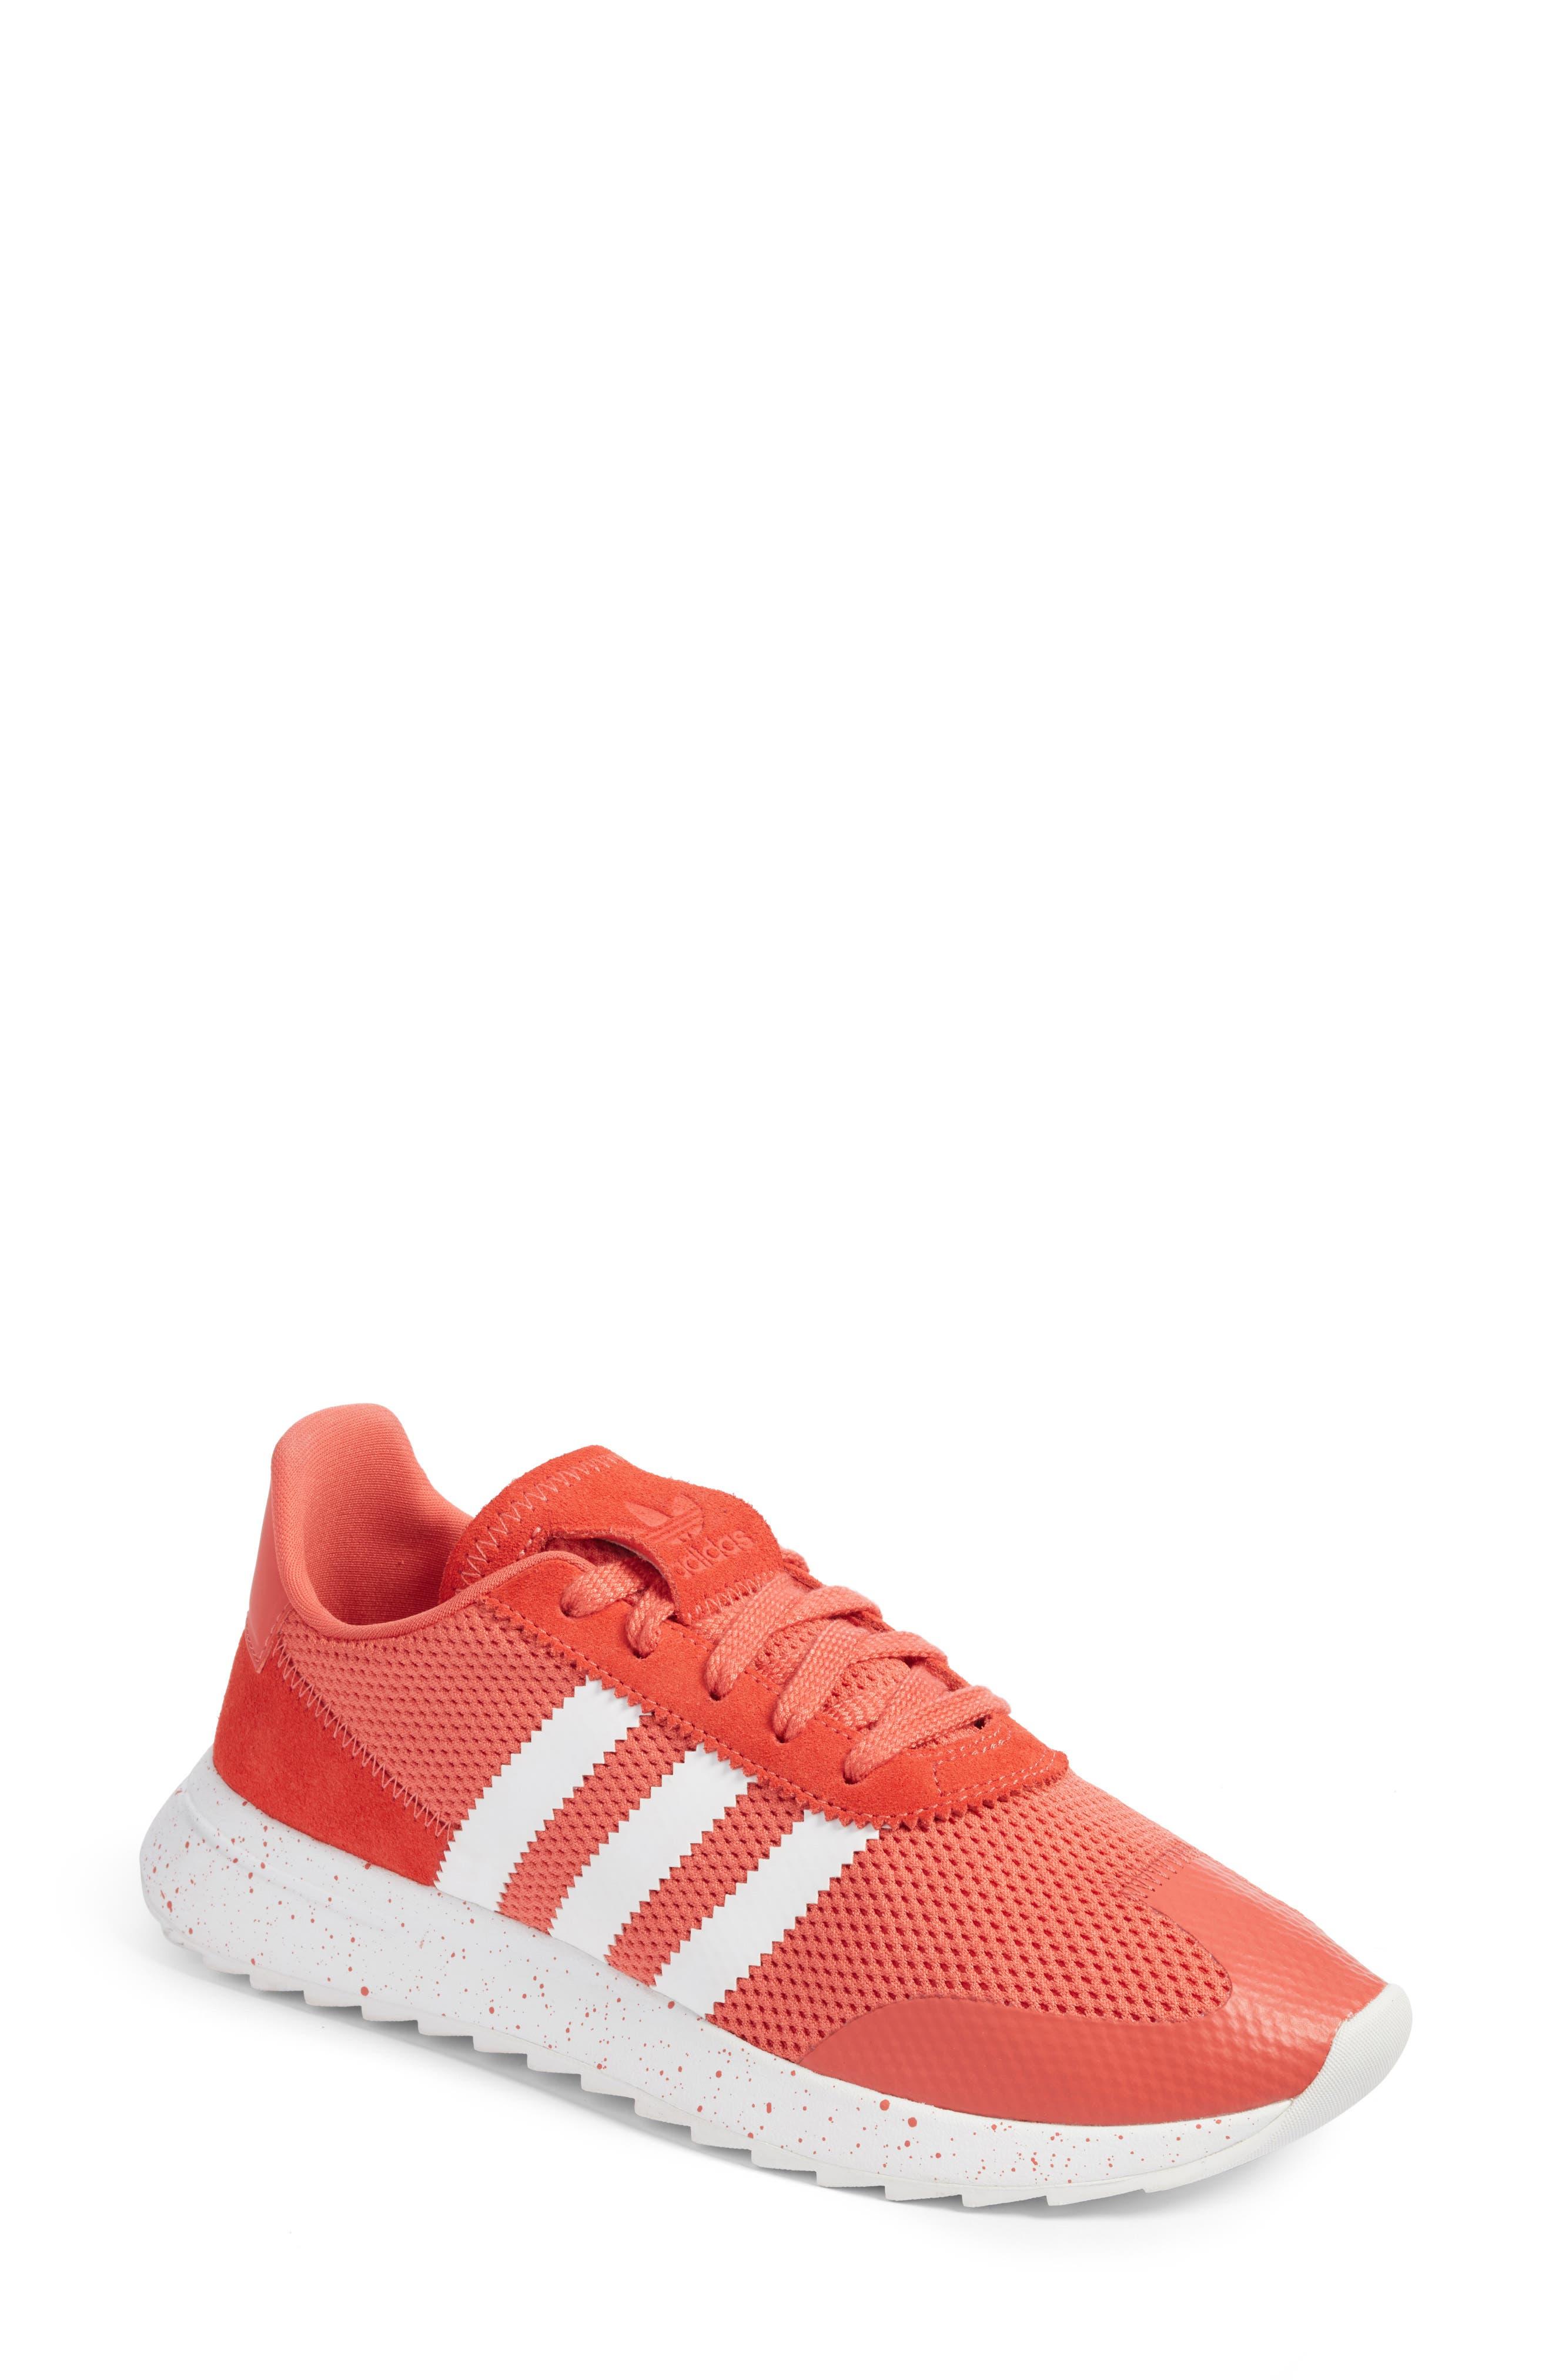 Flashback Sneaker,                             Main thumbnail 11, color,